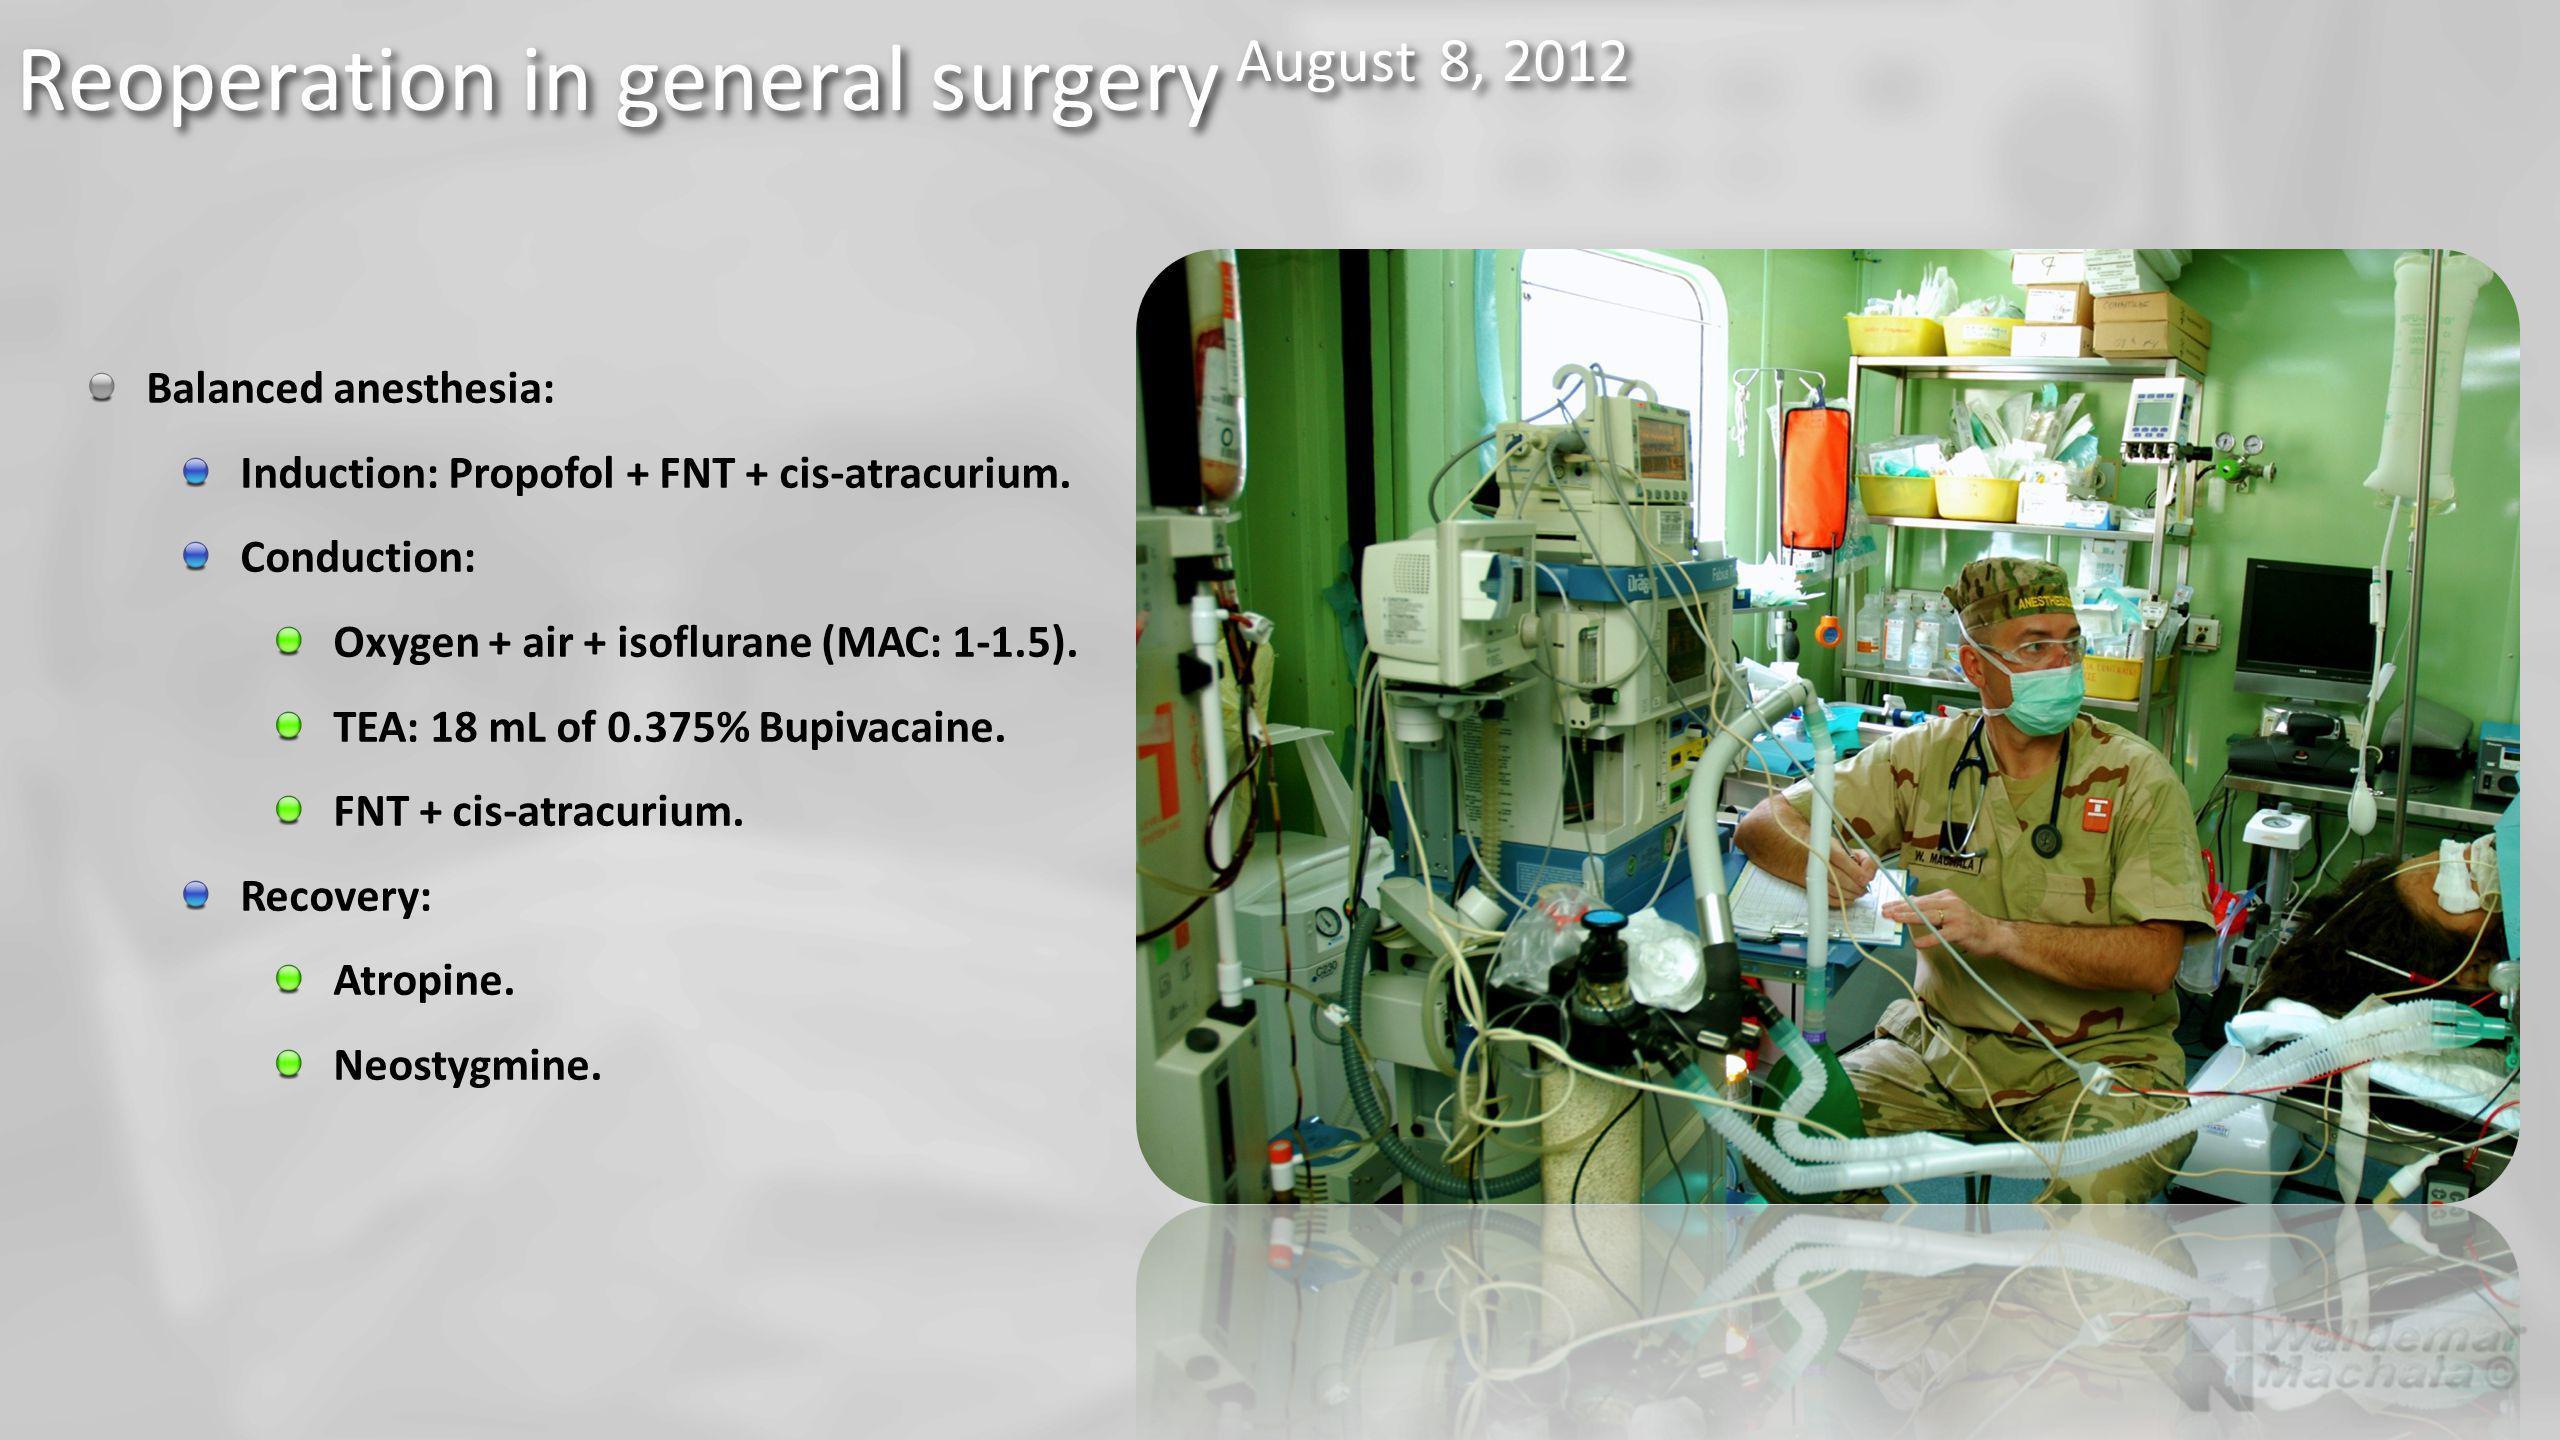 Balanced anesthesia: Induction: Propofol + FNT + cis-atracurium. Conduction: Oxygen + air + isoflurane (MAC: 1-1.5). TEA: 18 mL of 0.375% Bupivacaine.